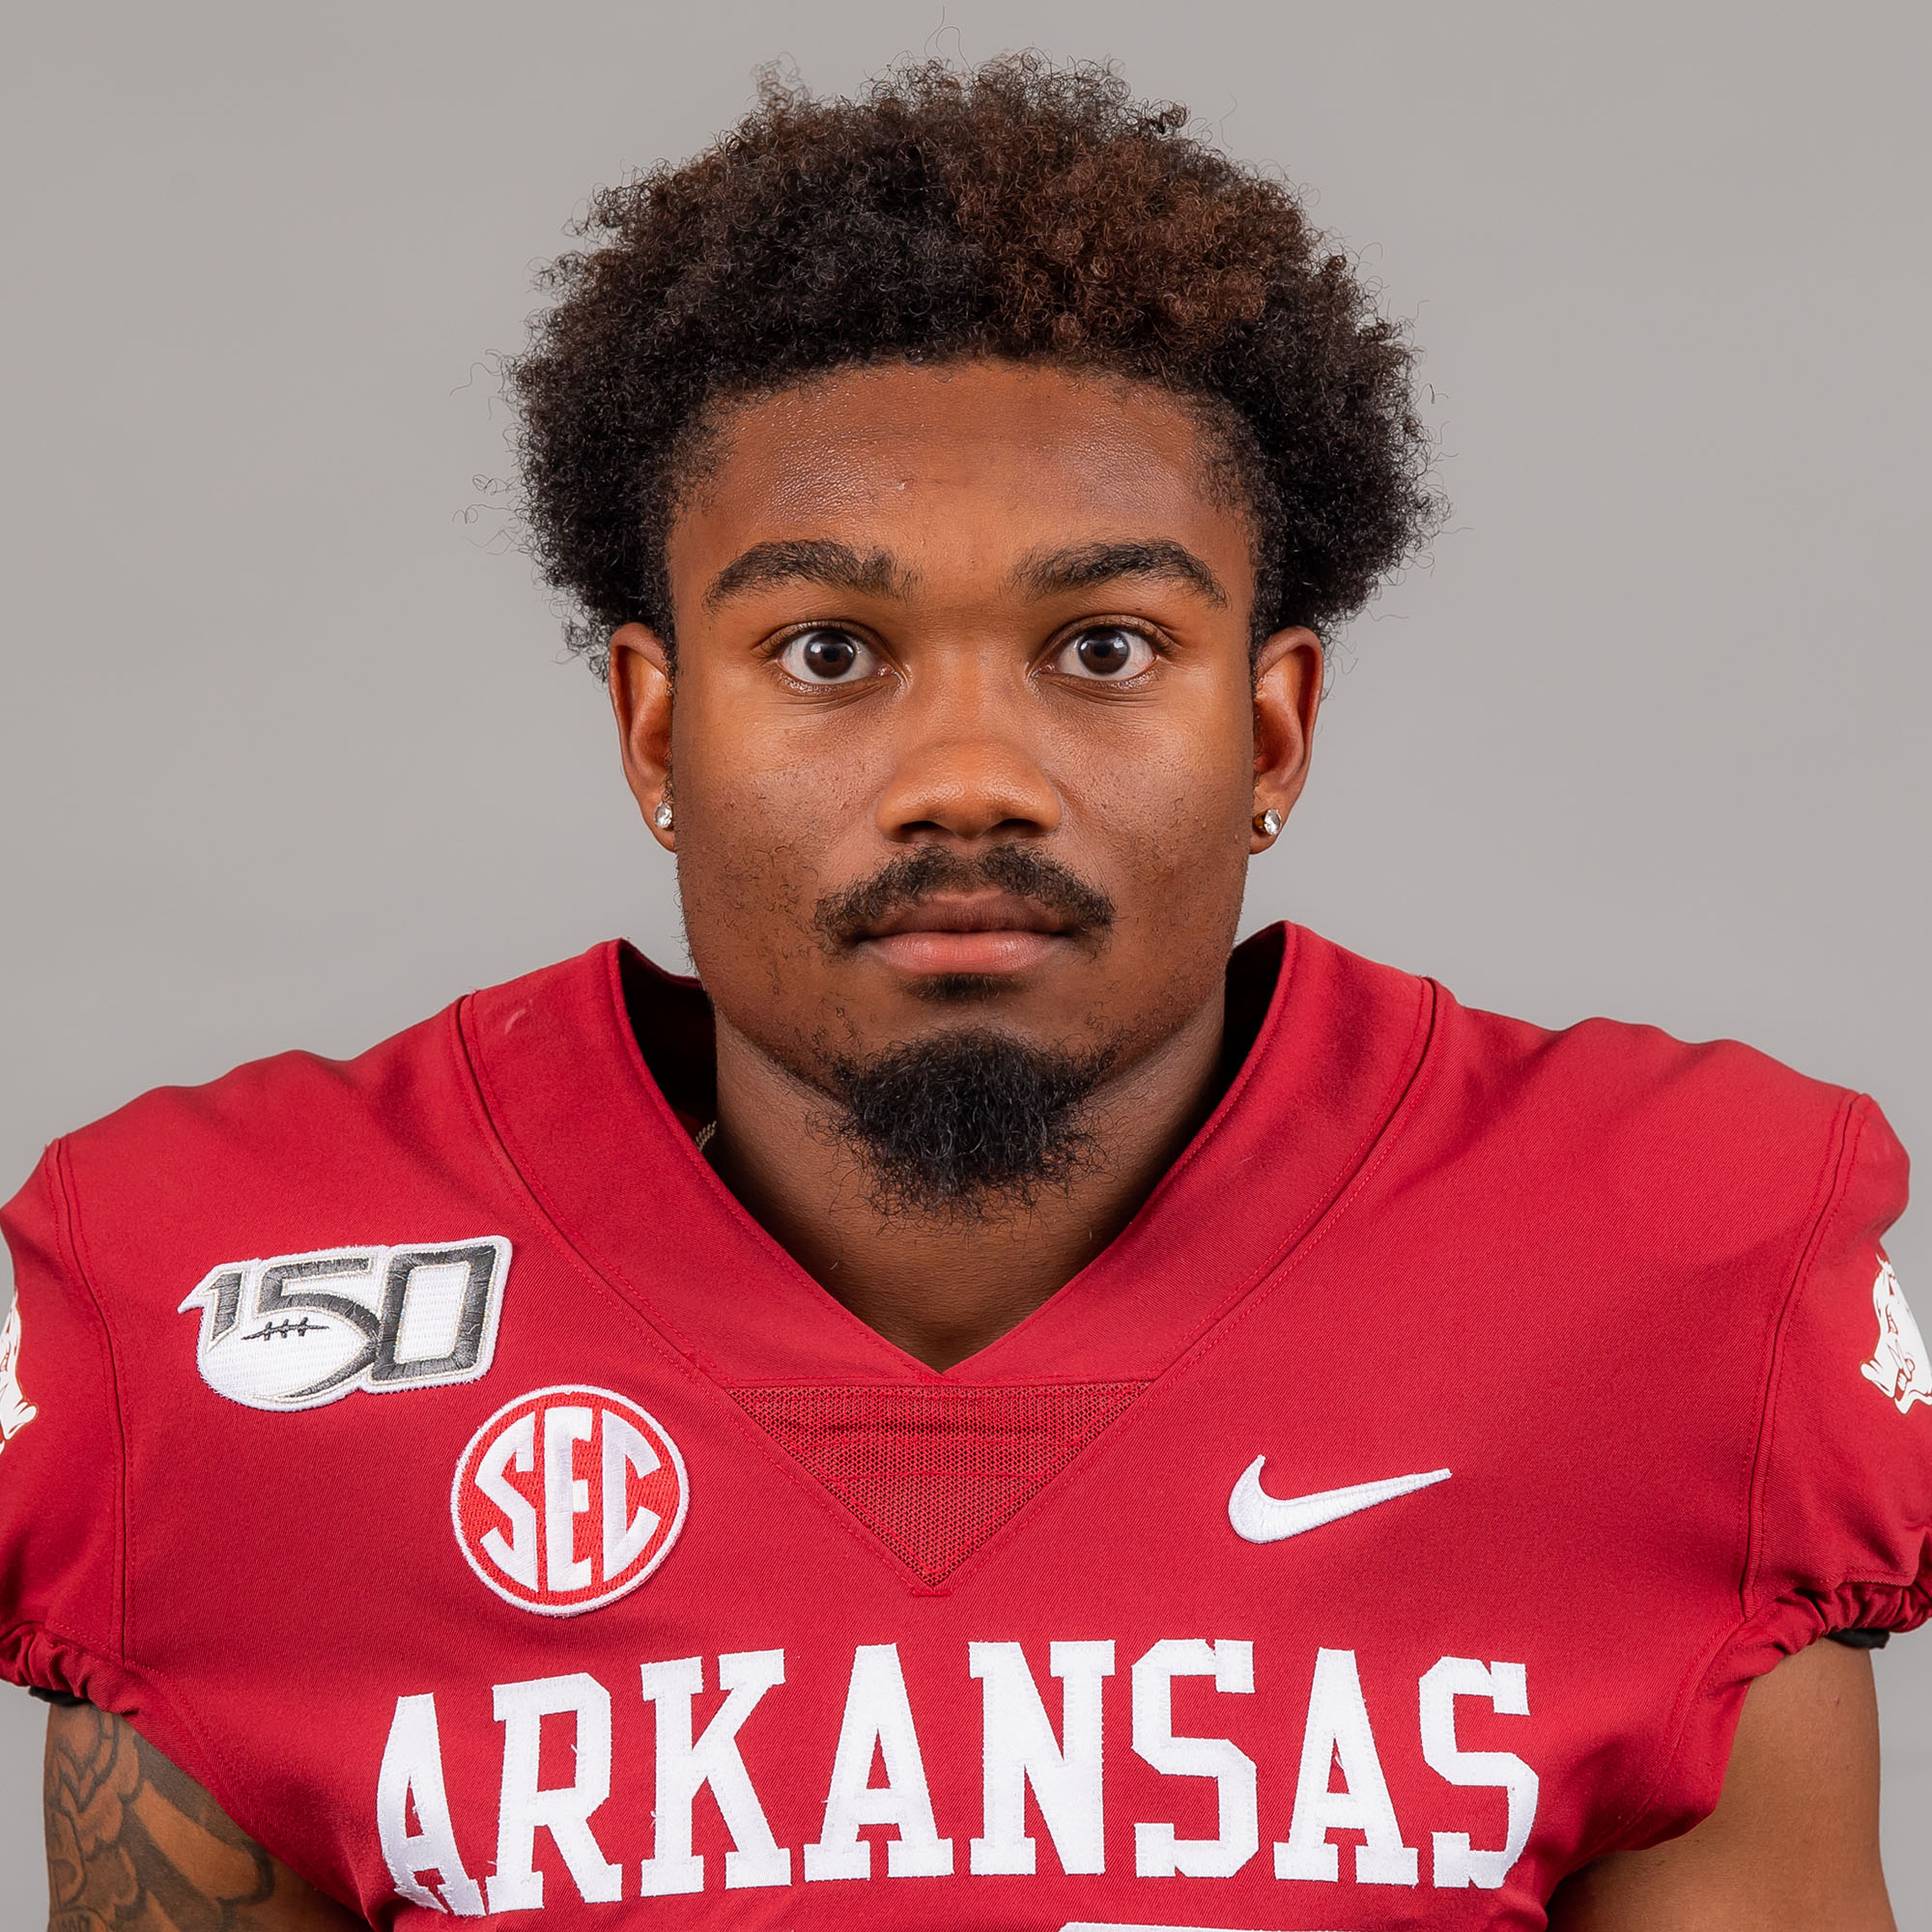 Josh Oglesby - Football - Arkansas Razorbacks